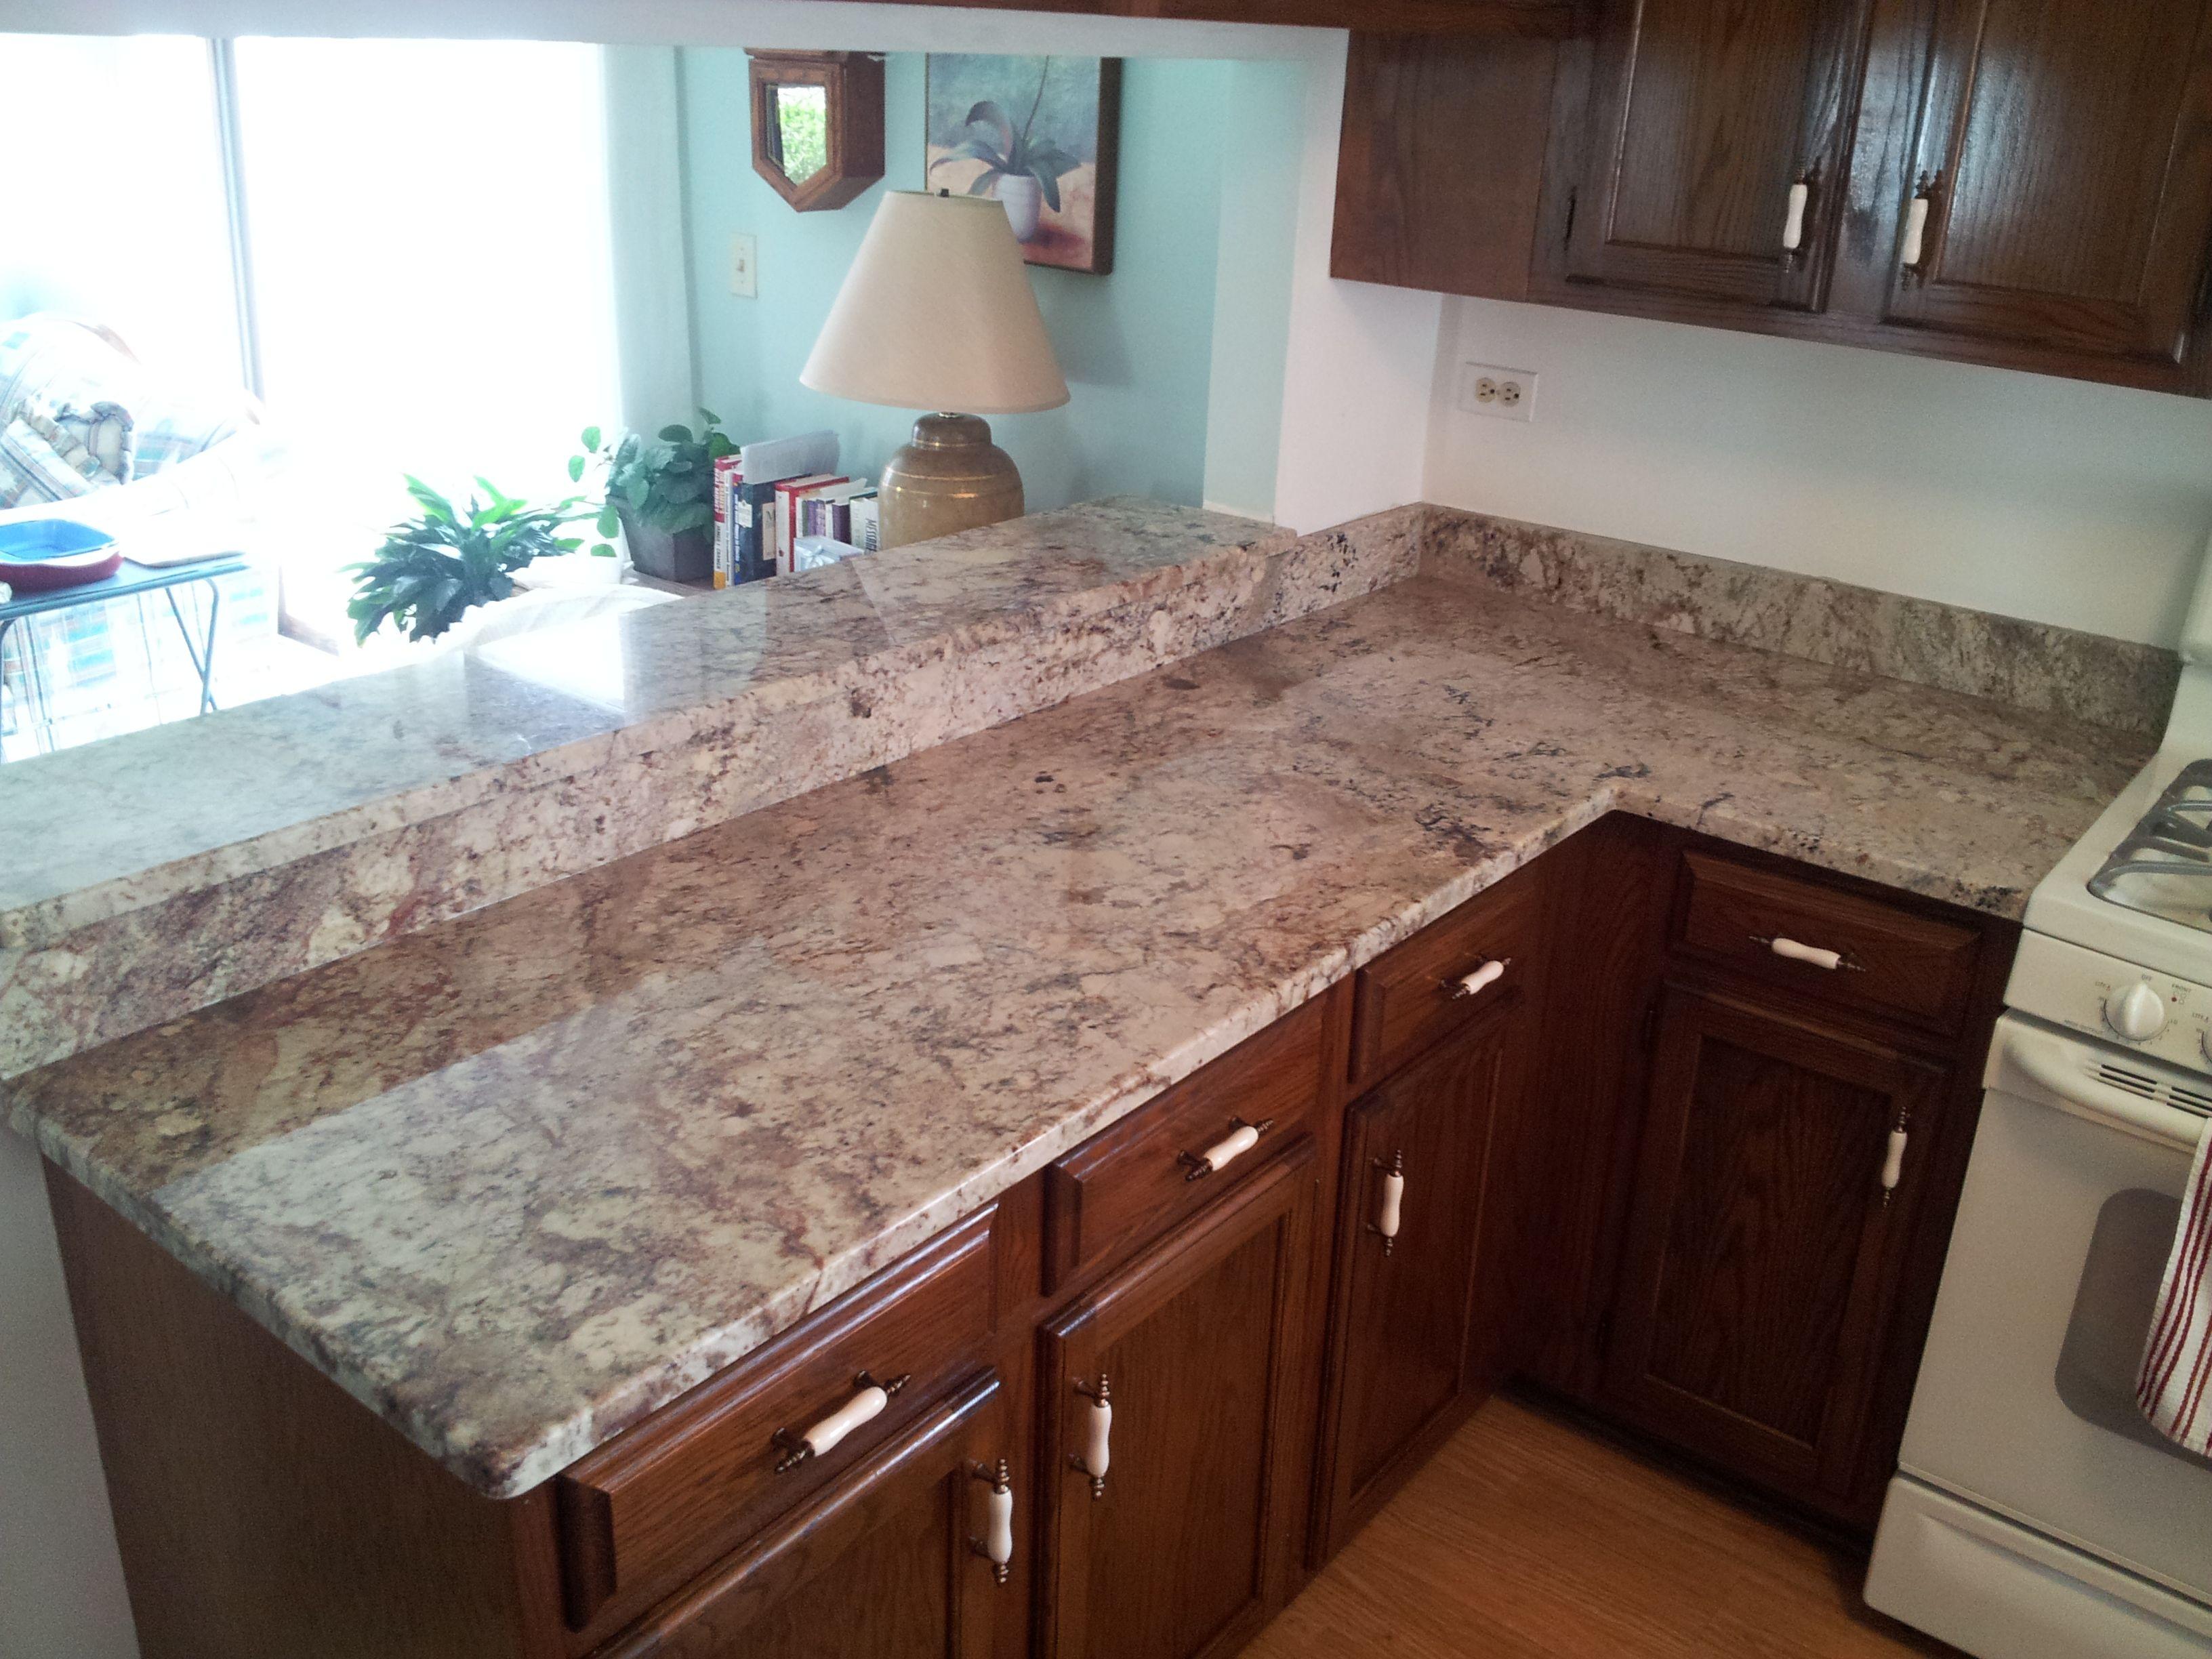 Charmant Art Granite Countertops Inc. 1020 Lunt Ave . Unit F Schaumburg IL , 60193  Tel